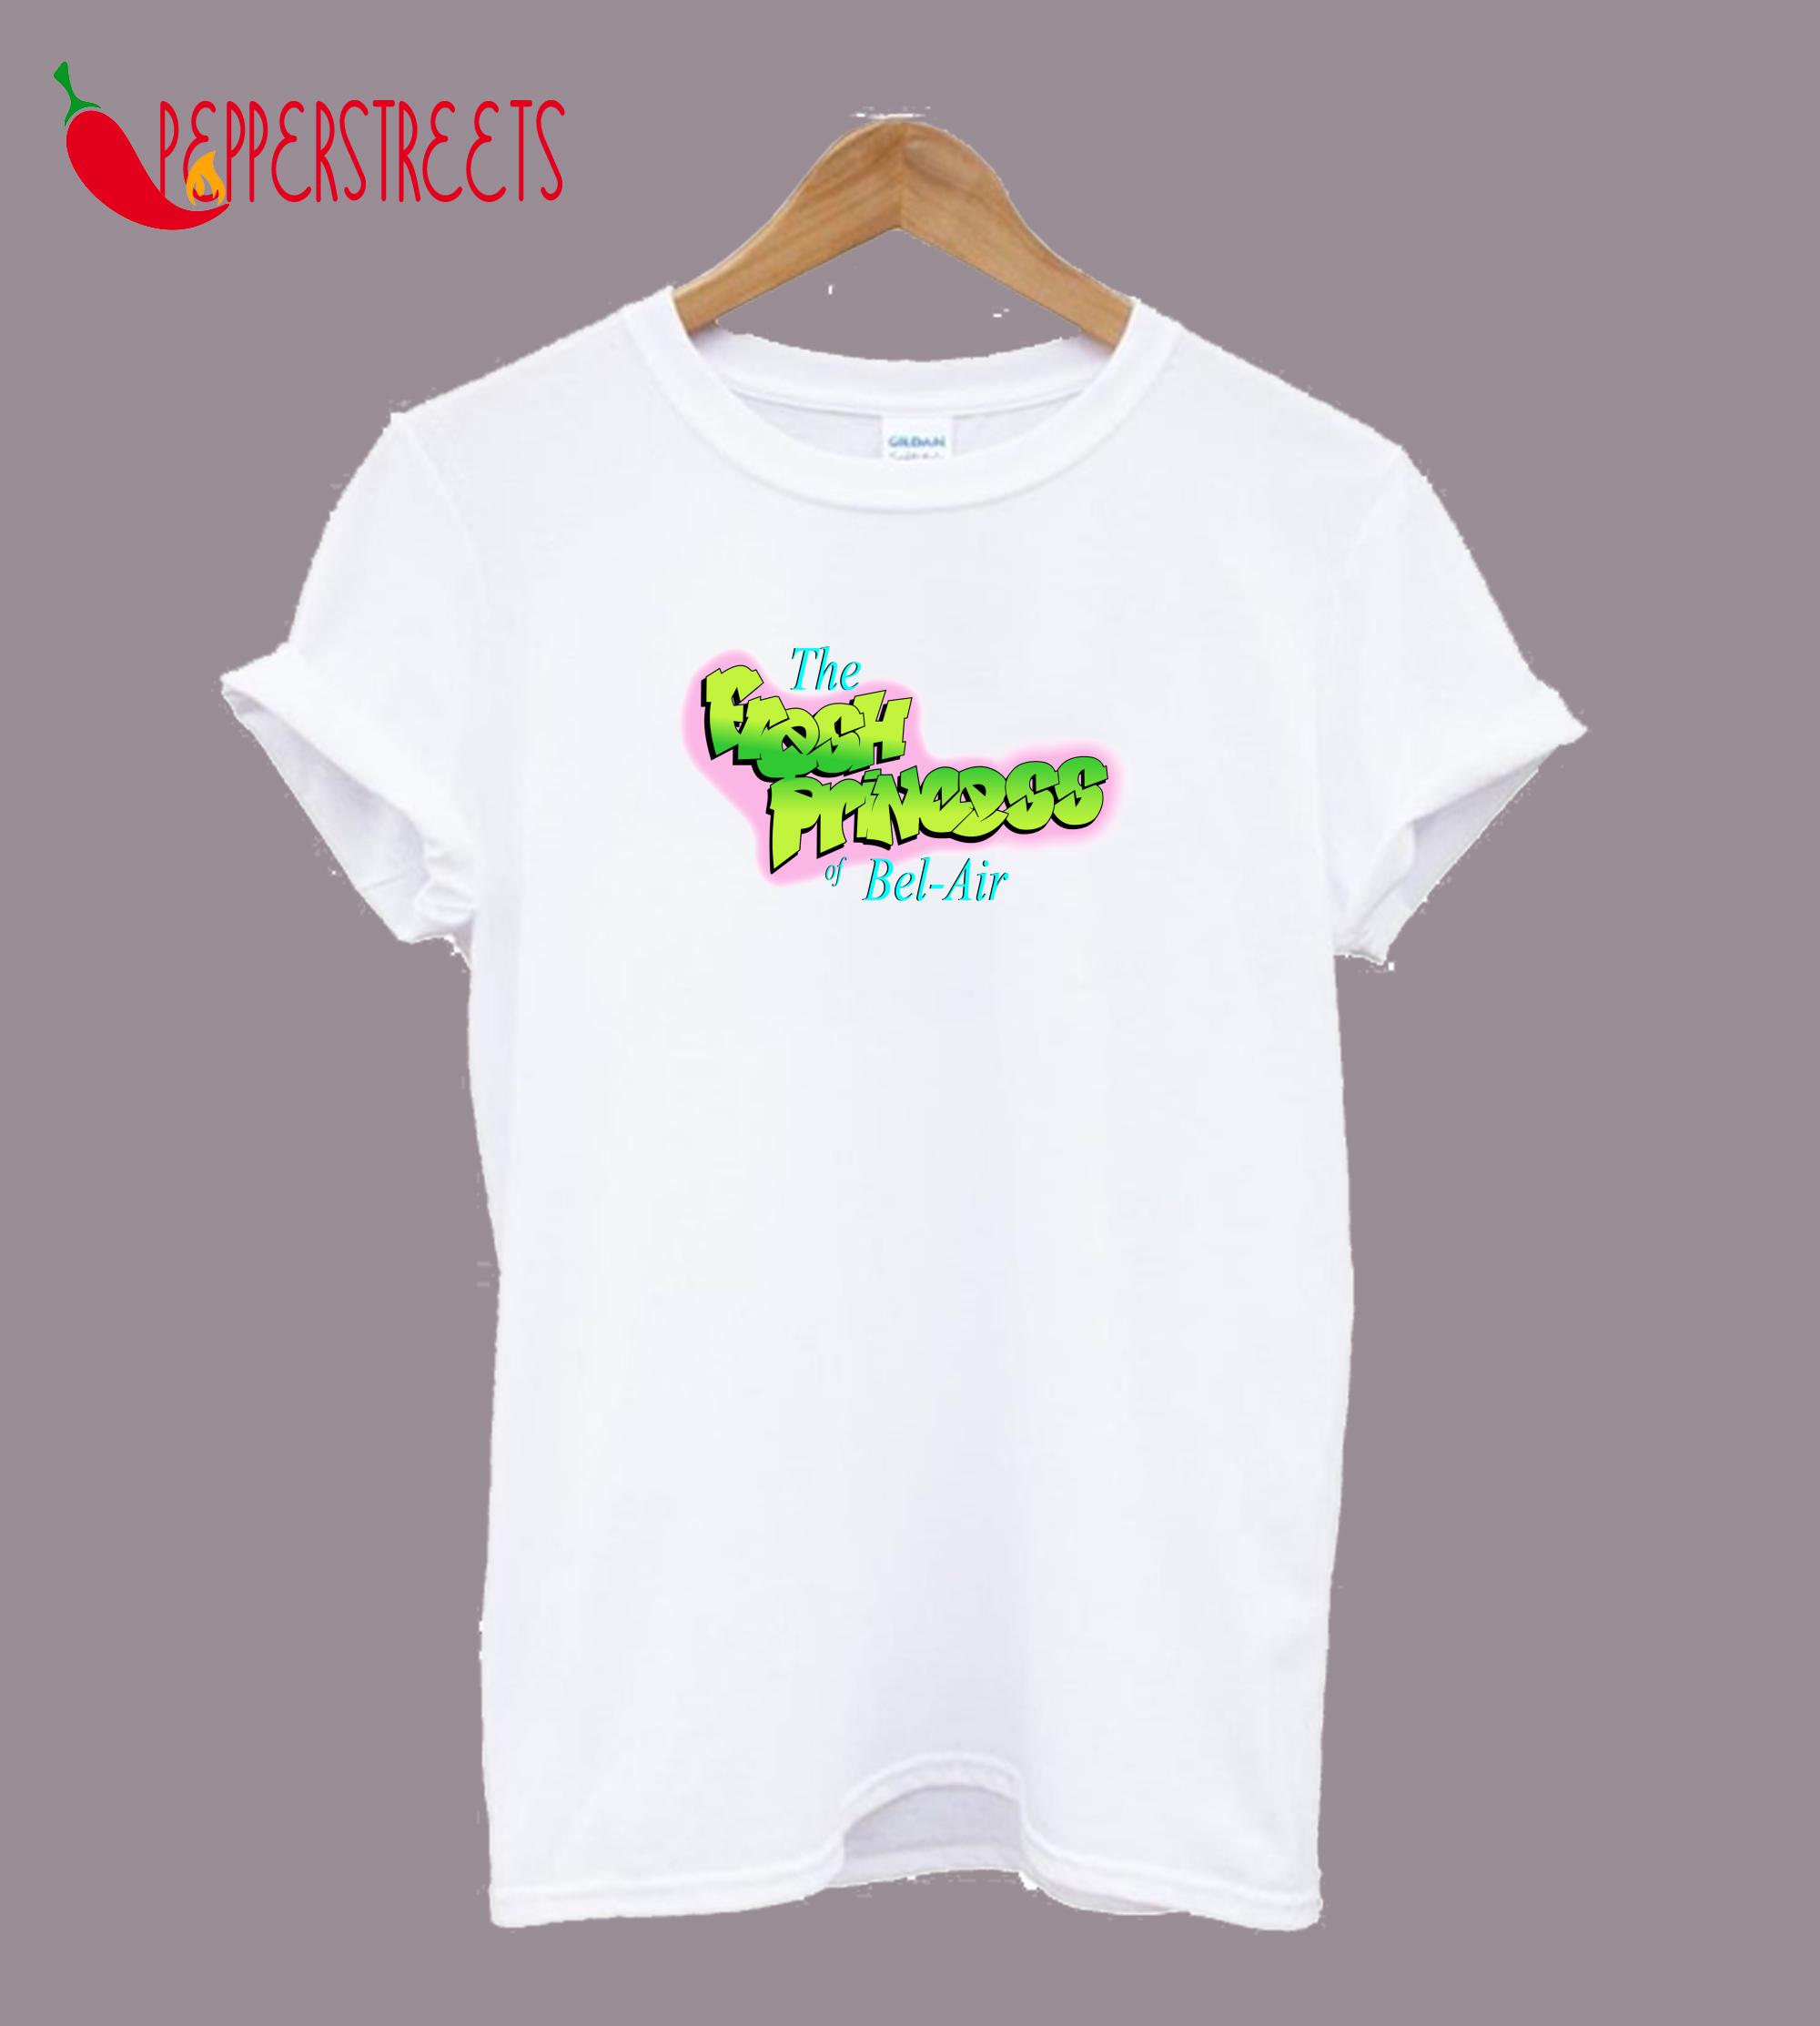 The Fresh Princess of Bel-Air T-Shirt